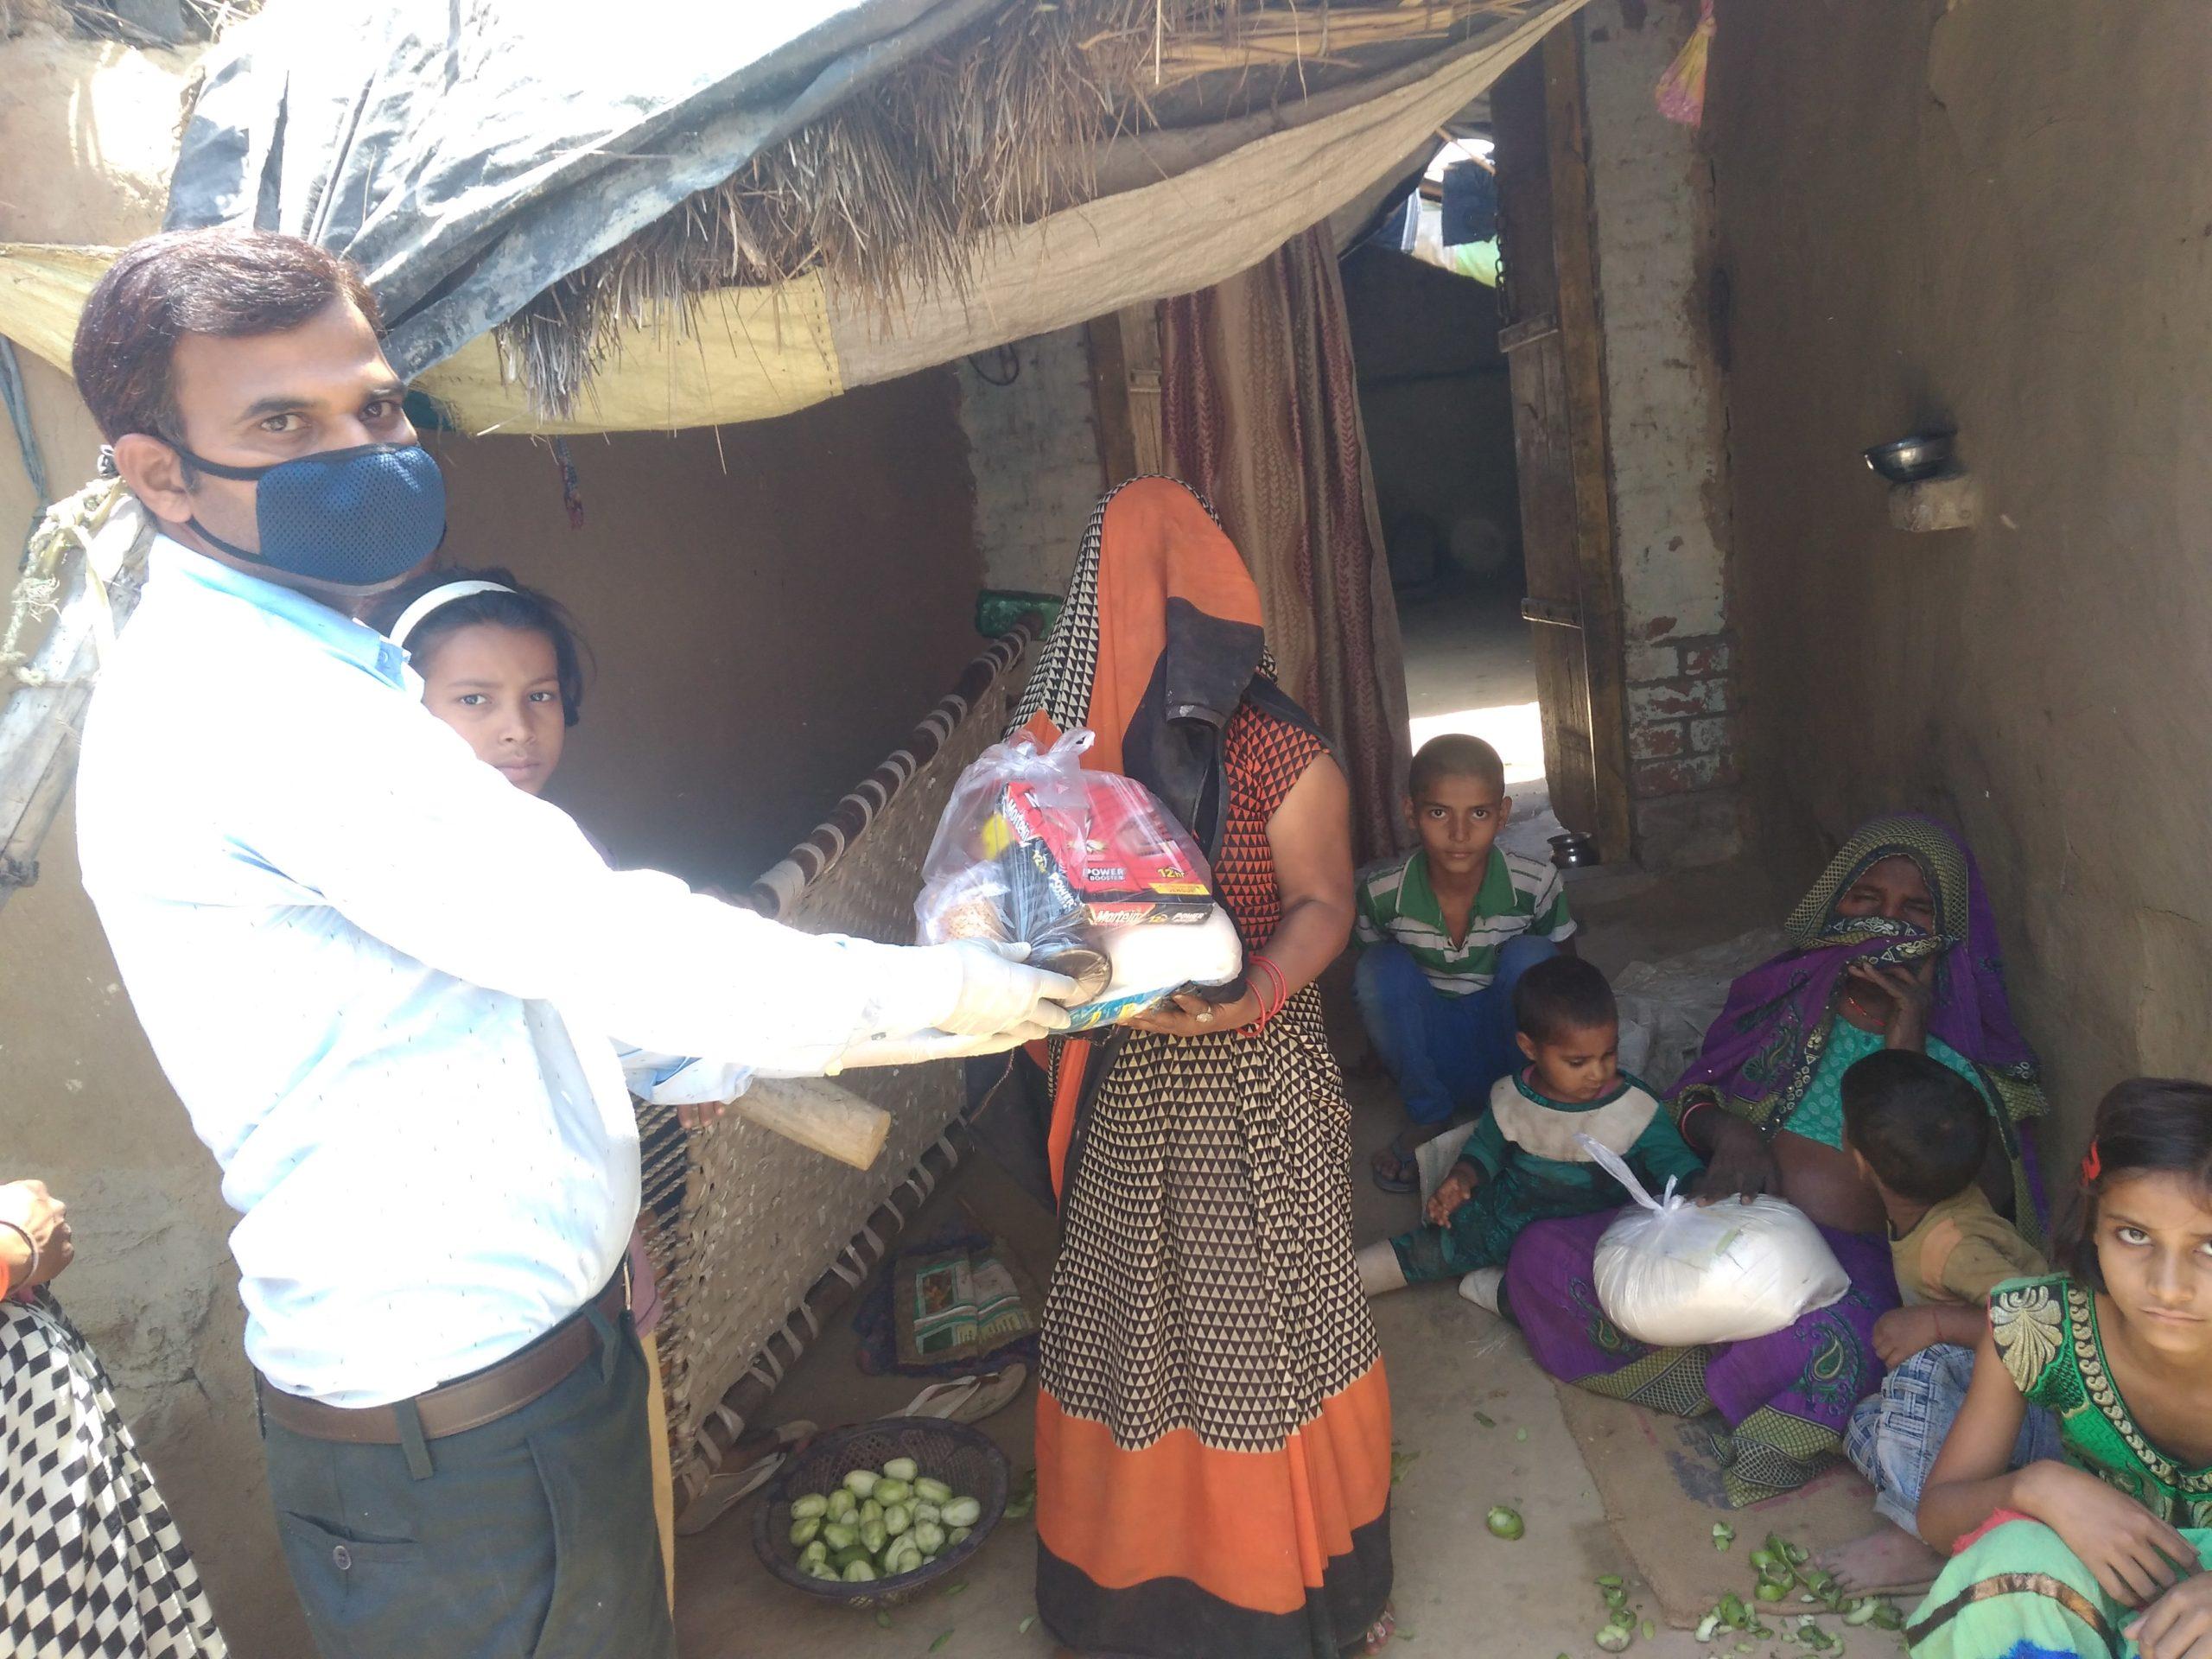 Ration Distribution at Mainpuri, Uttar Pradesh